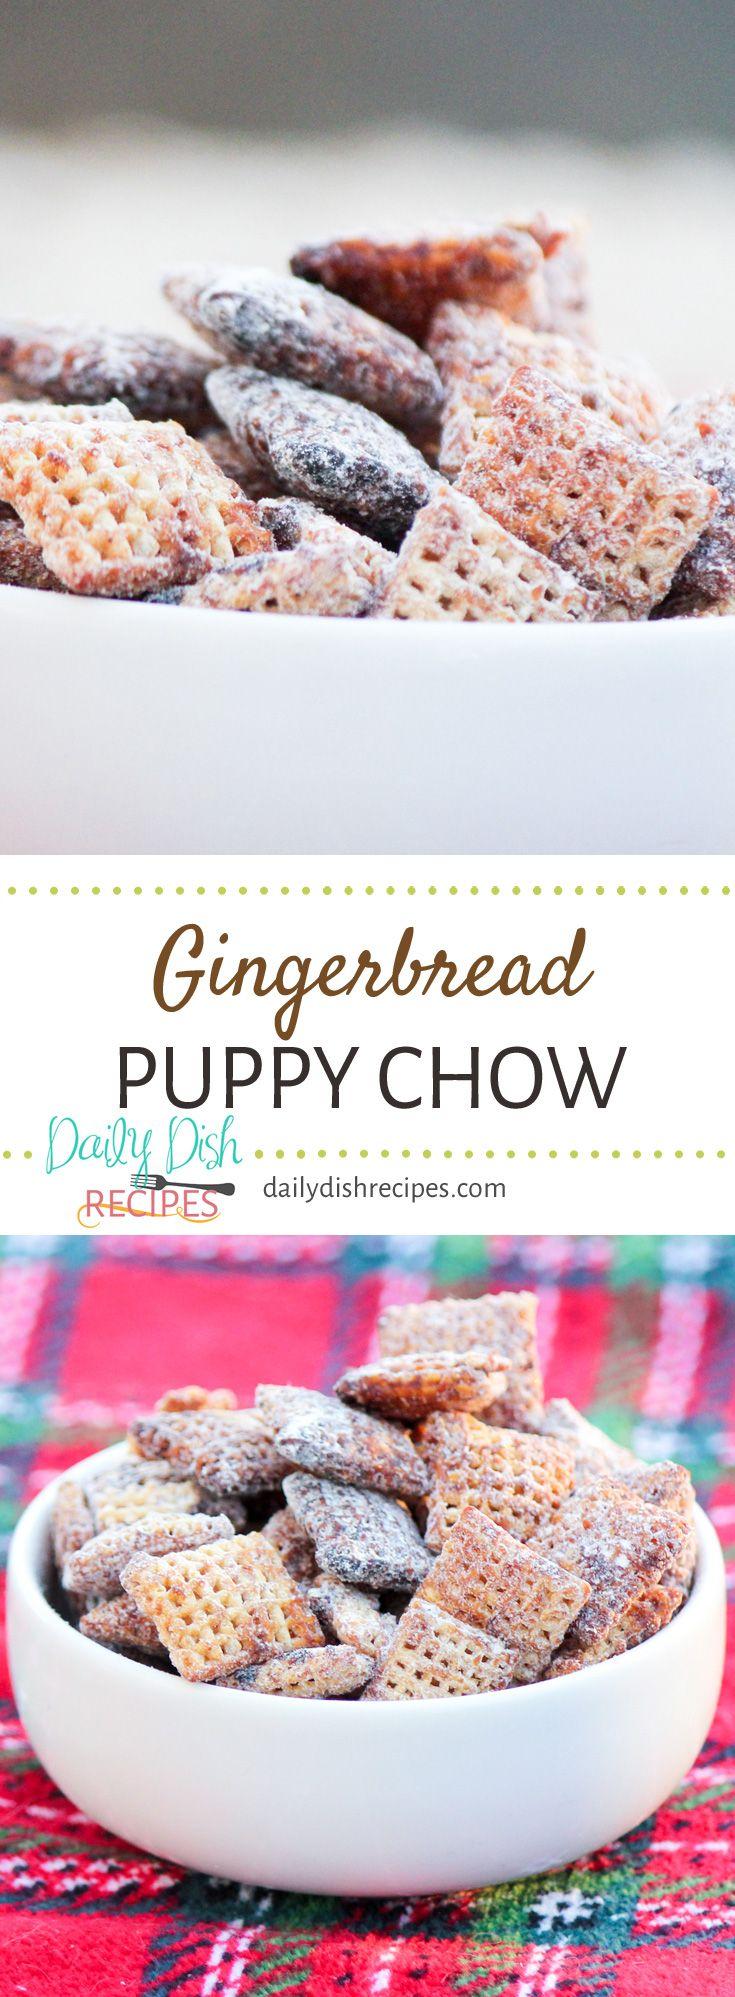 Gingerbread Puppy Chow Snack Mix via dailydishrec…Edit